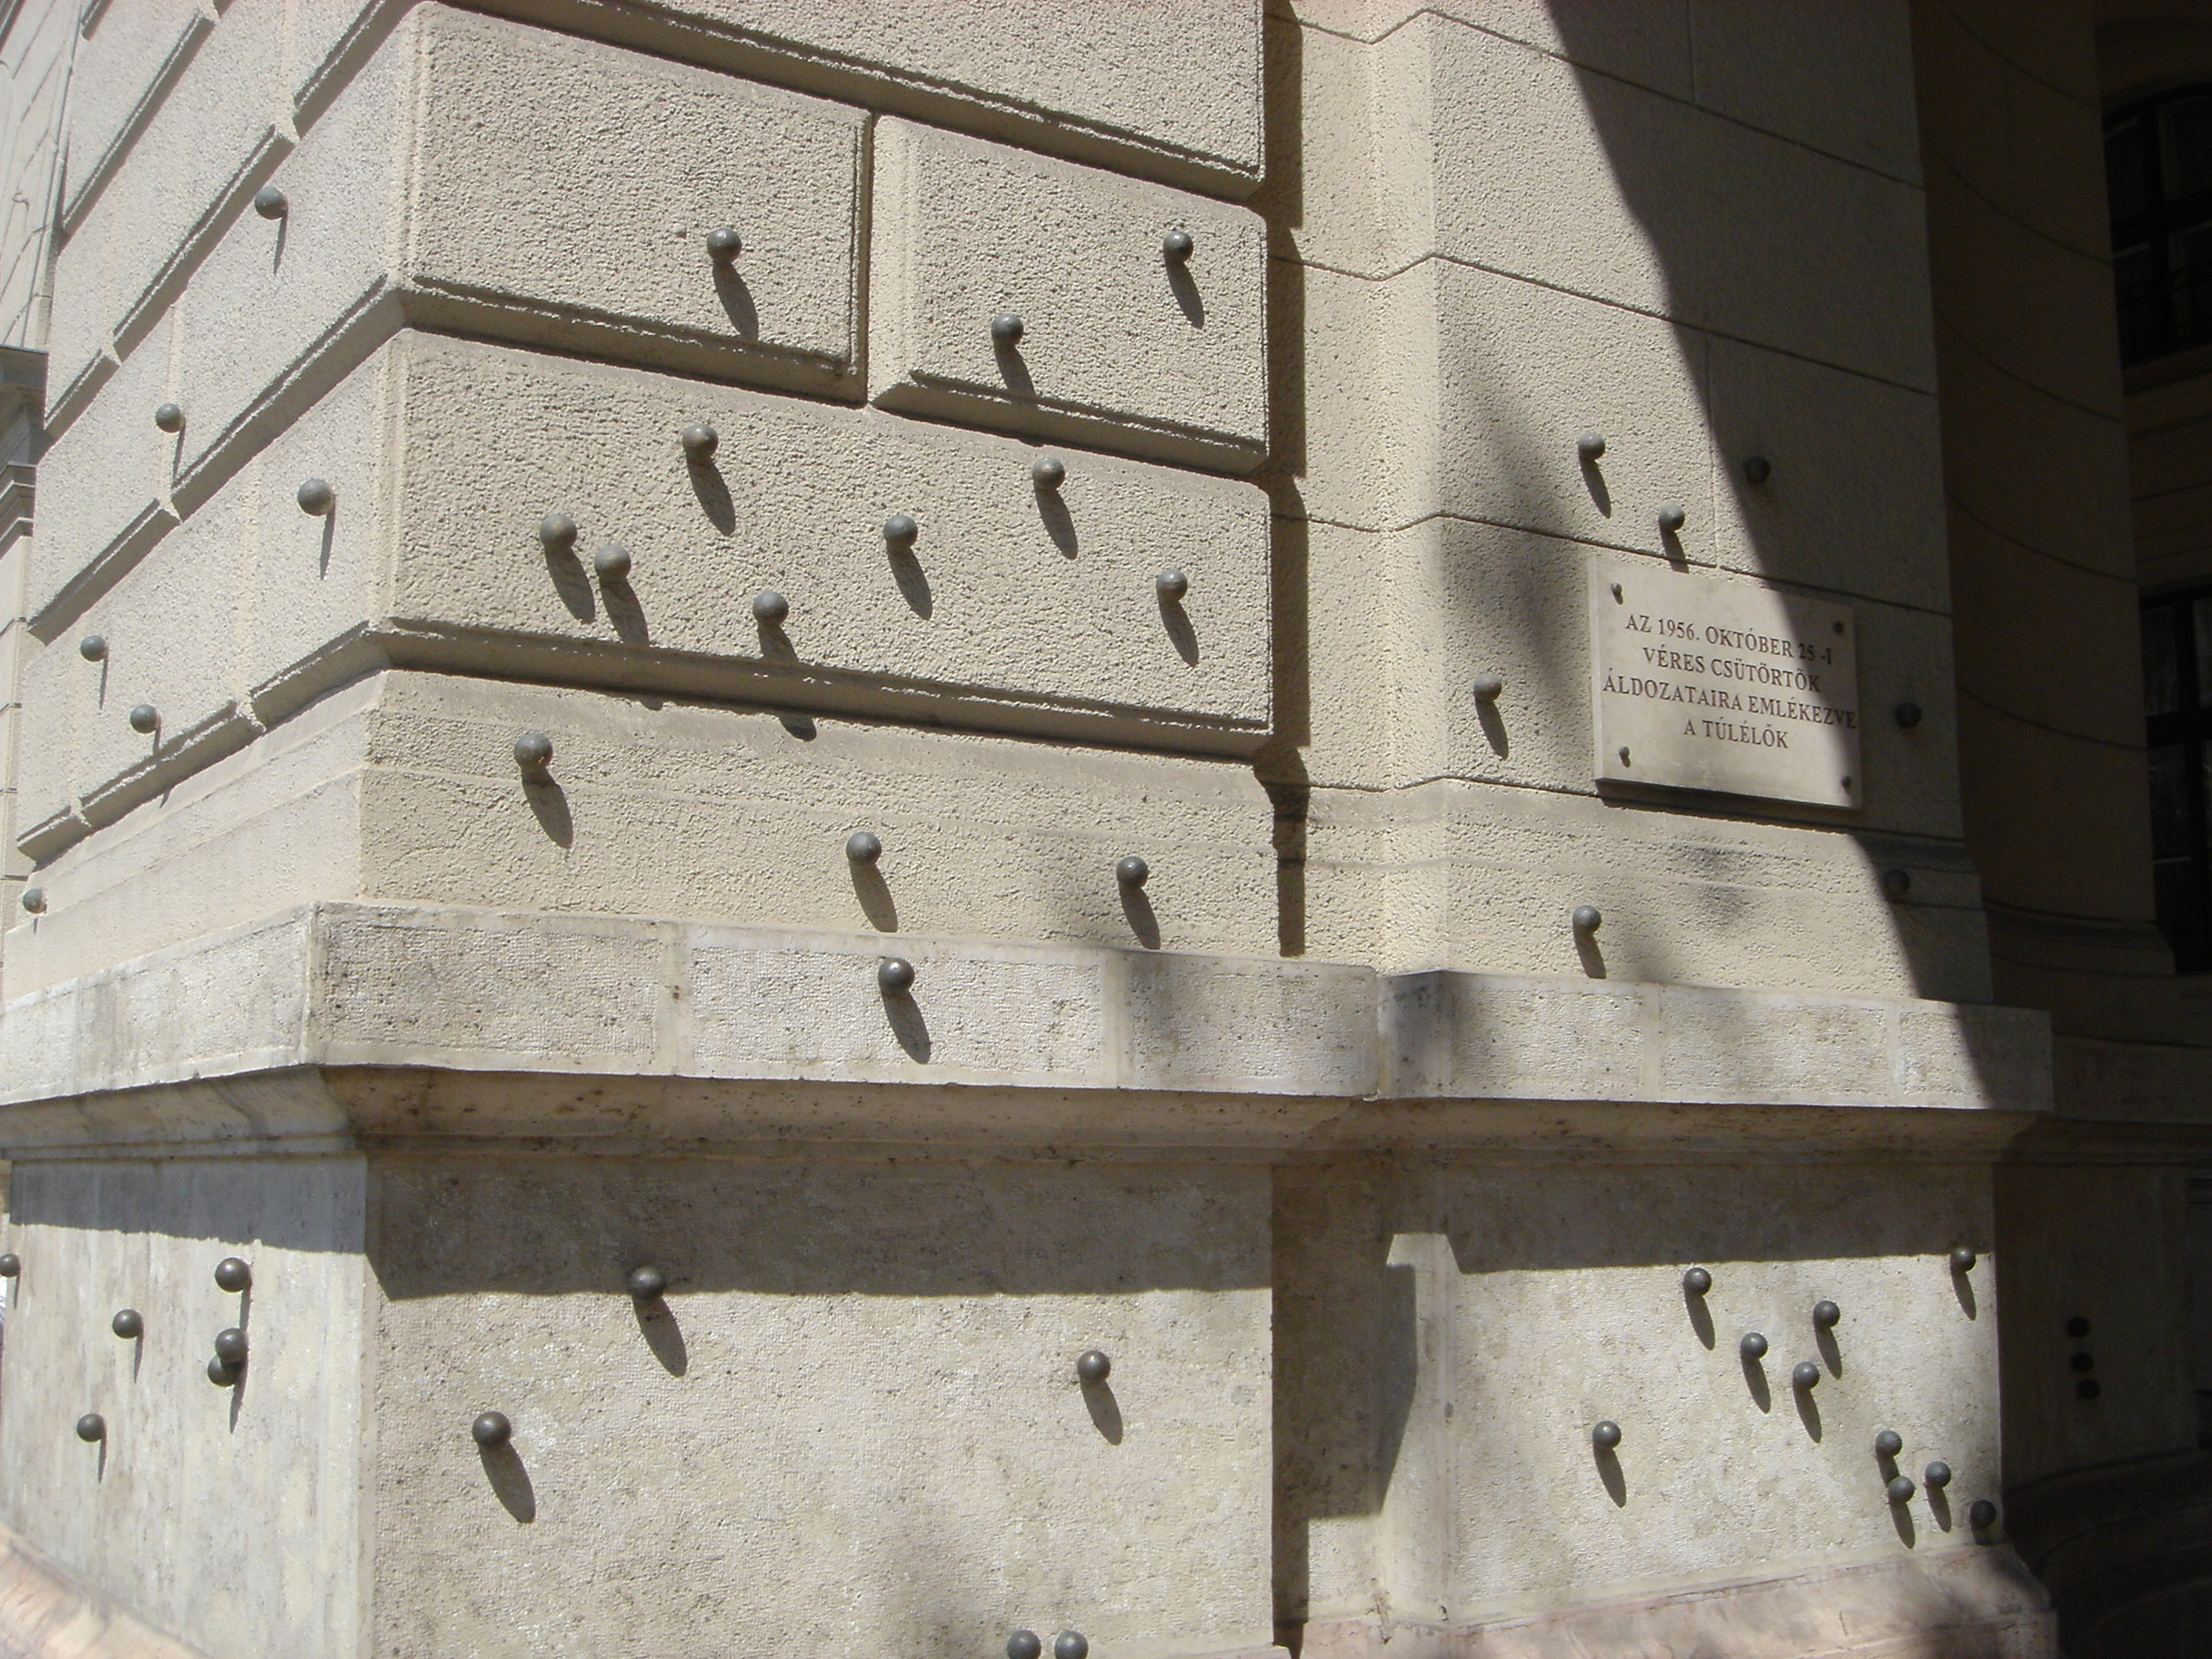 Metal Pellets Marking Bullet Holes from 1956 Revolution on Kossuth Lajos Square